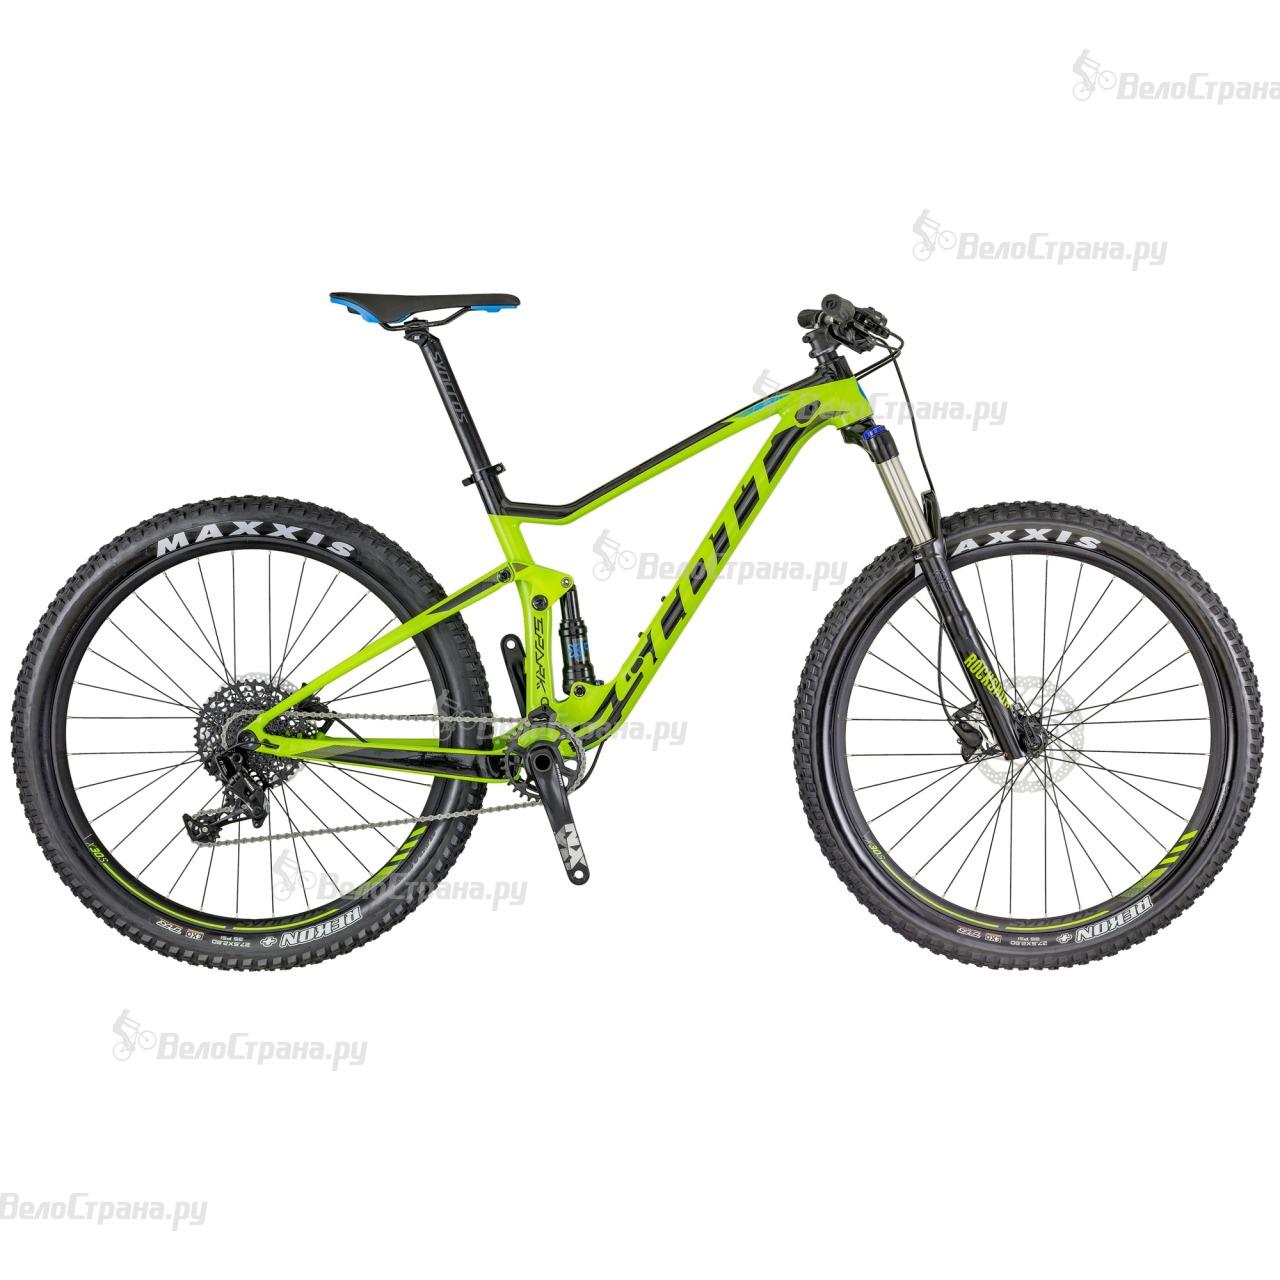 Велосипед Scott Spark 740 (2018) scott spark 740 2017